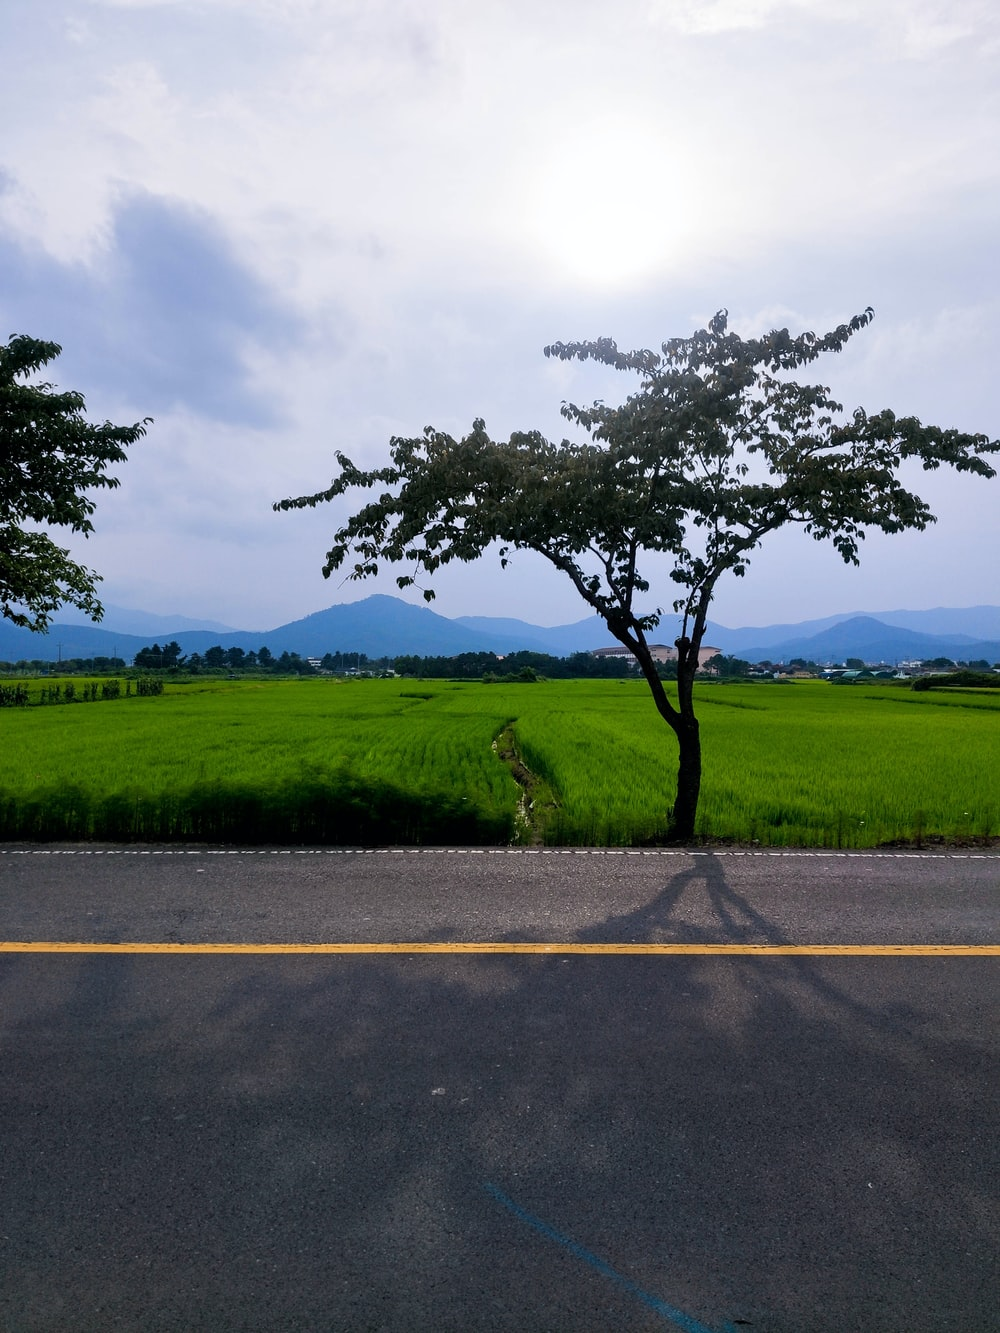 green grass field near road